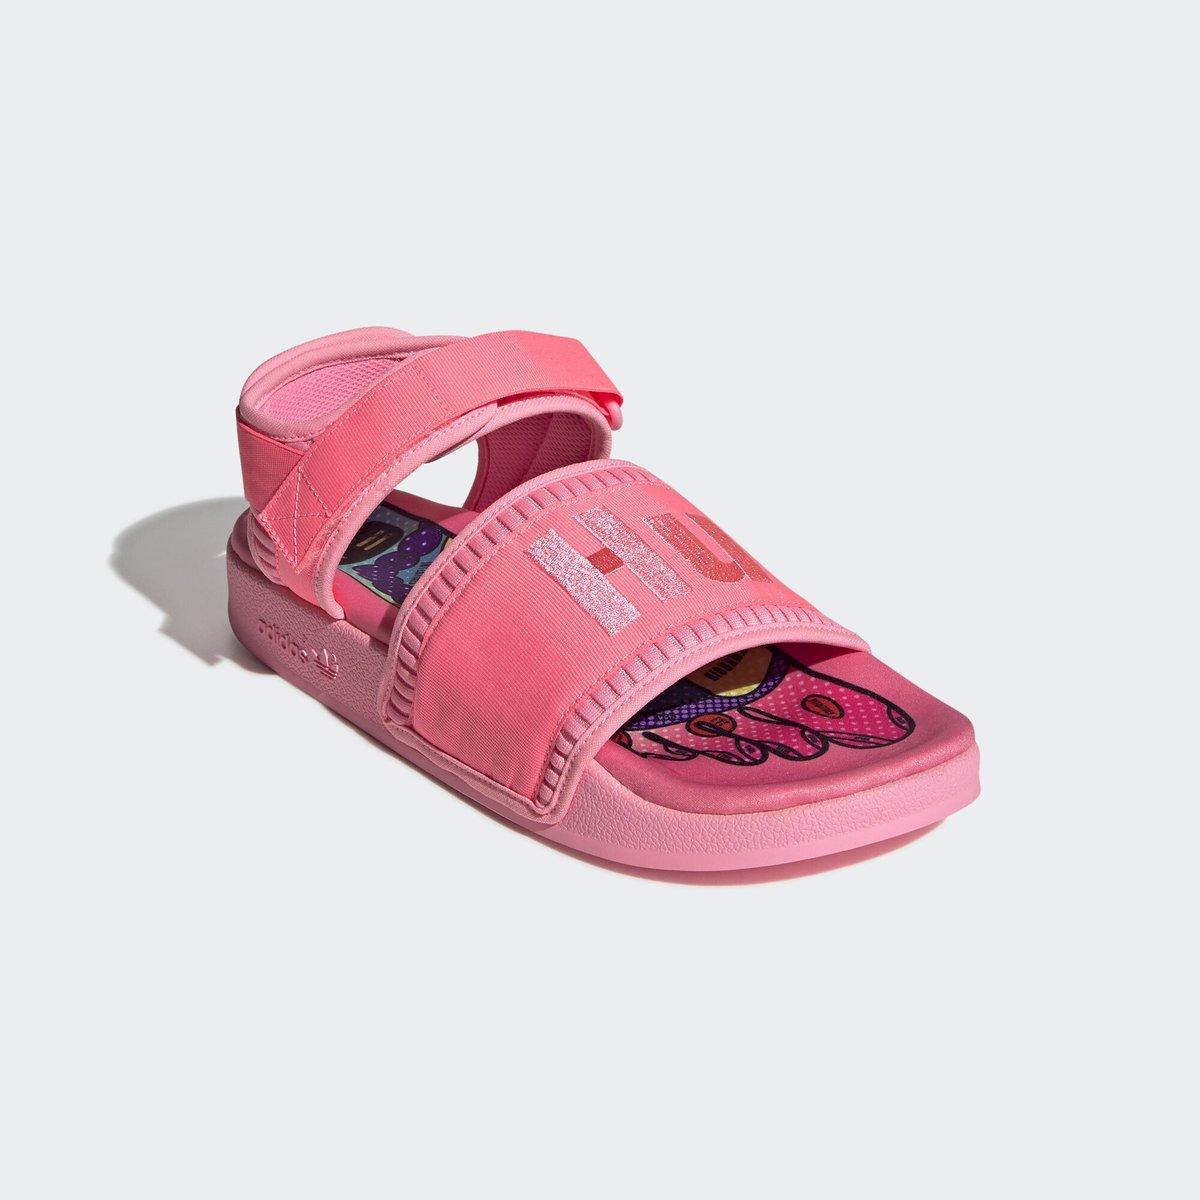 OFF on @footlocker. Pharrell x adidas